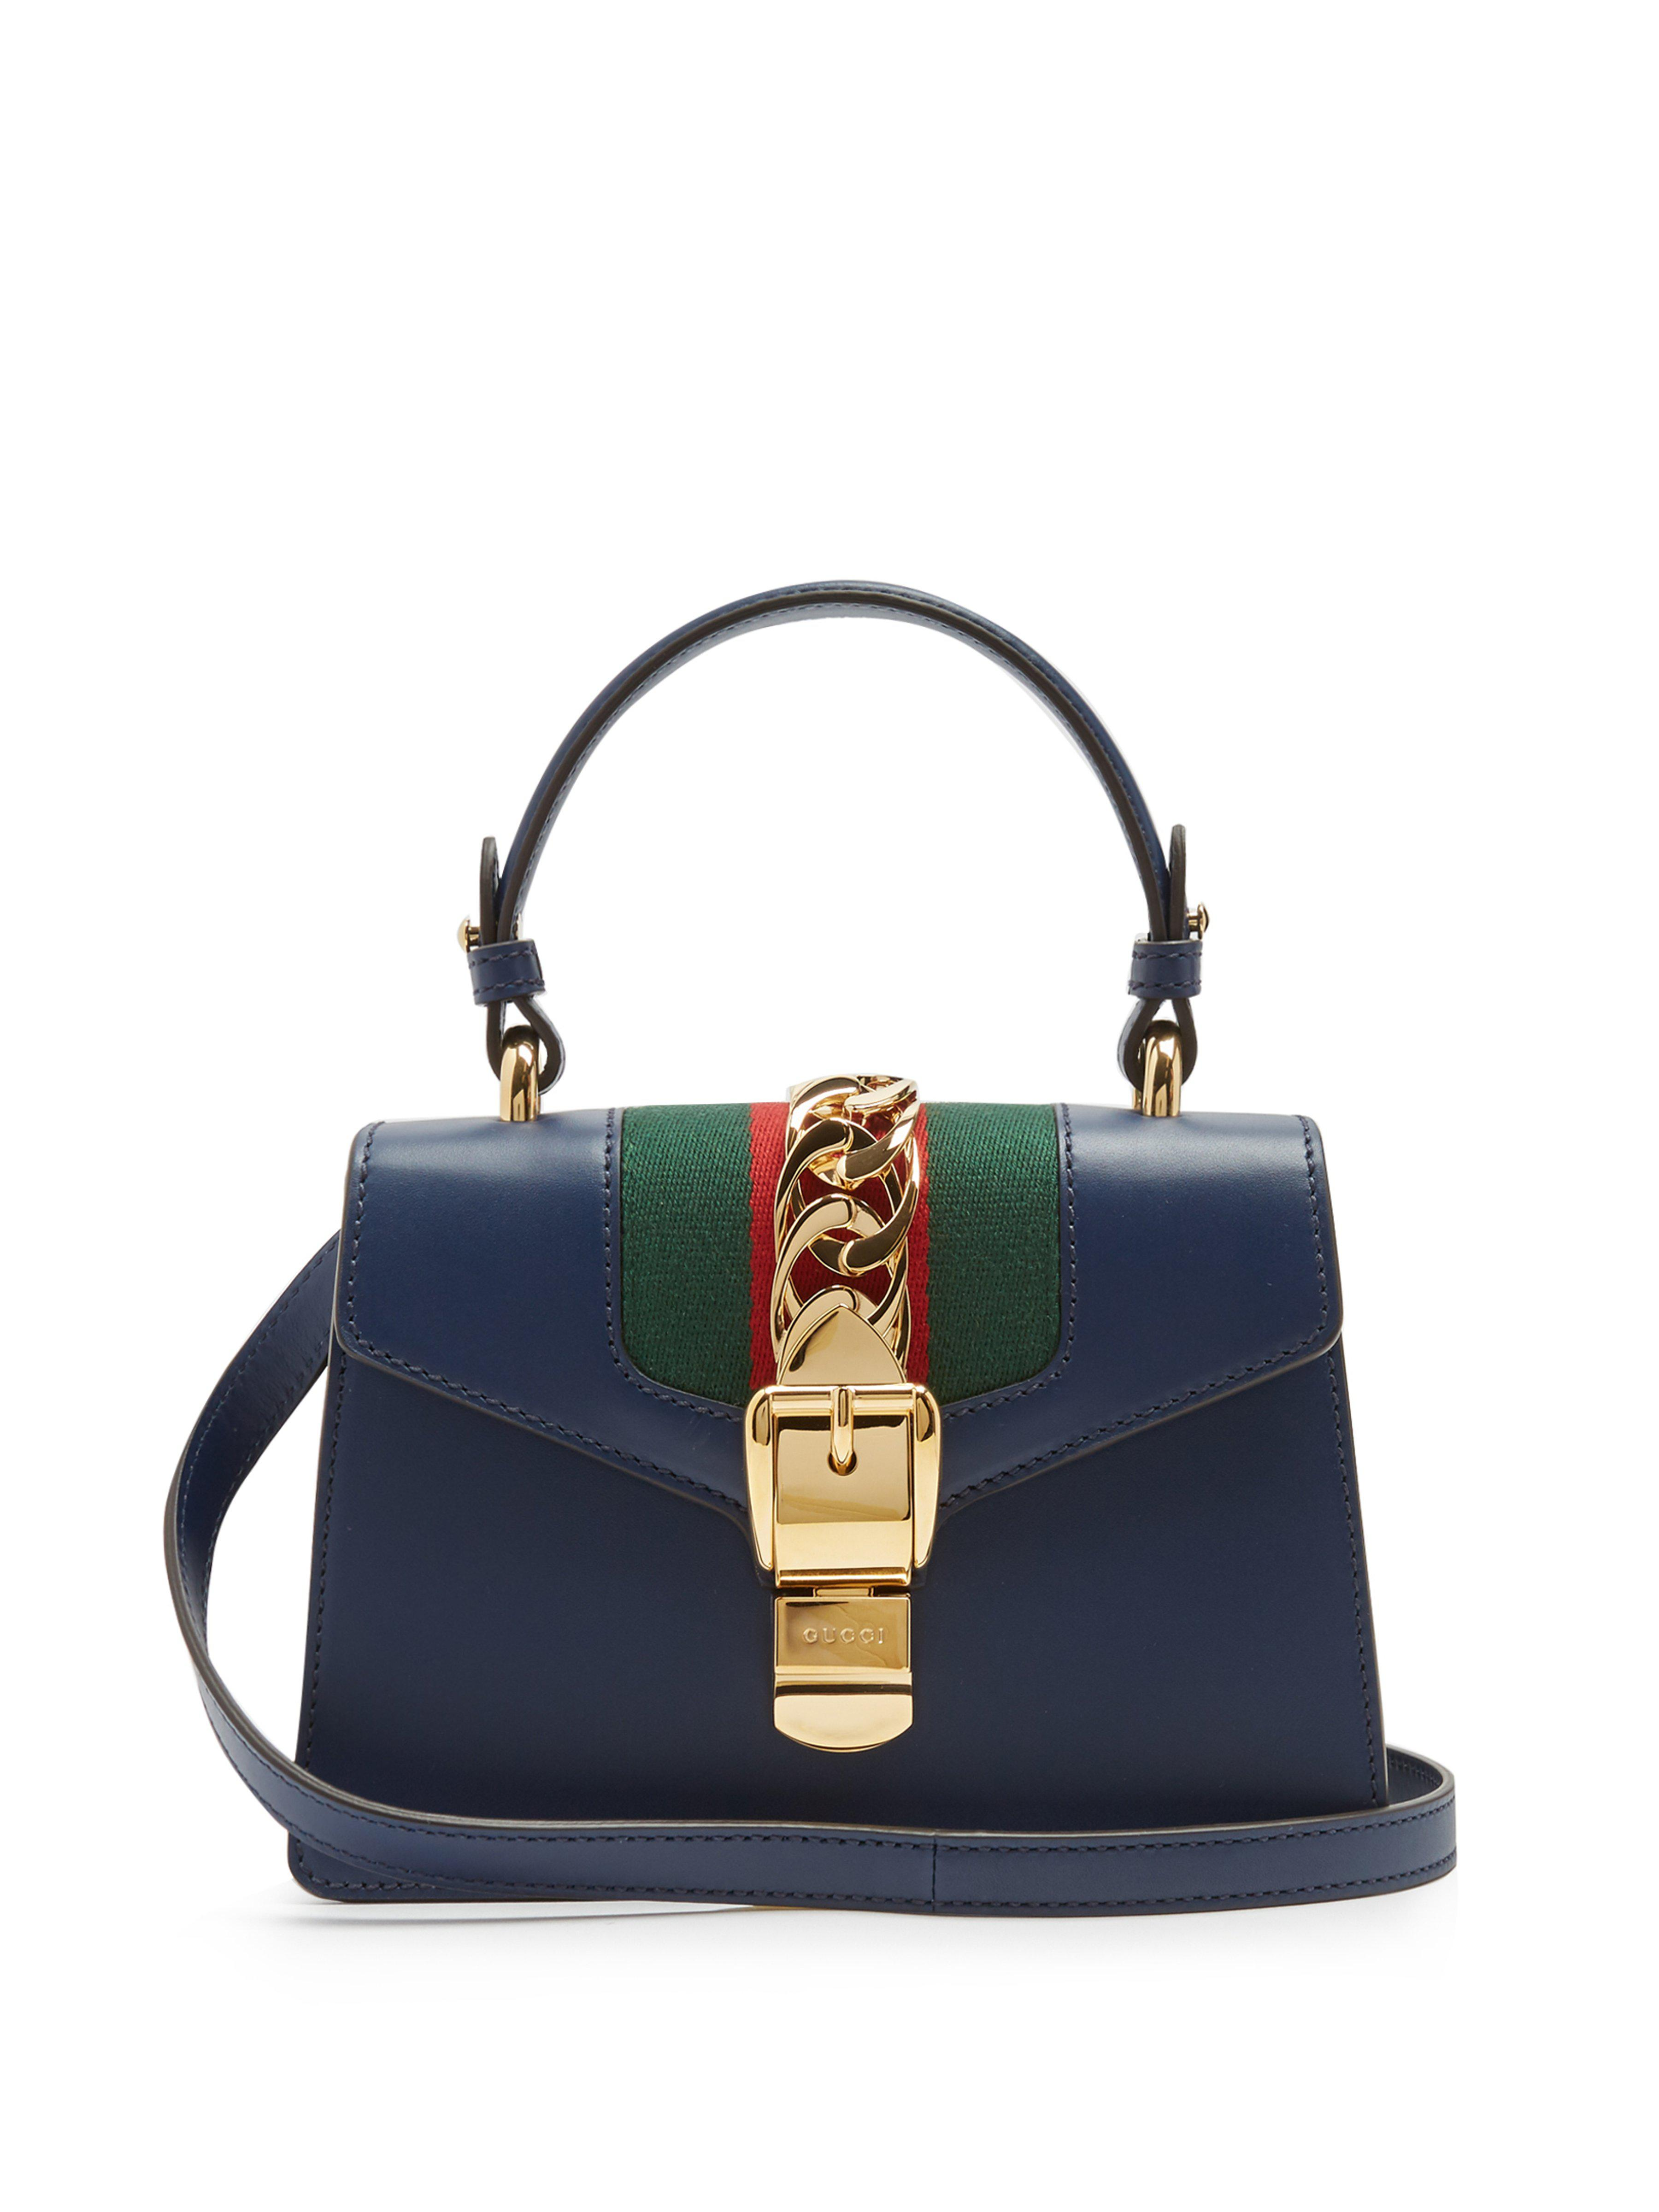 5ca9c17a545826 Gucci Sylvie Mini Leather Shoulder Bag in Blue - Lyst